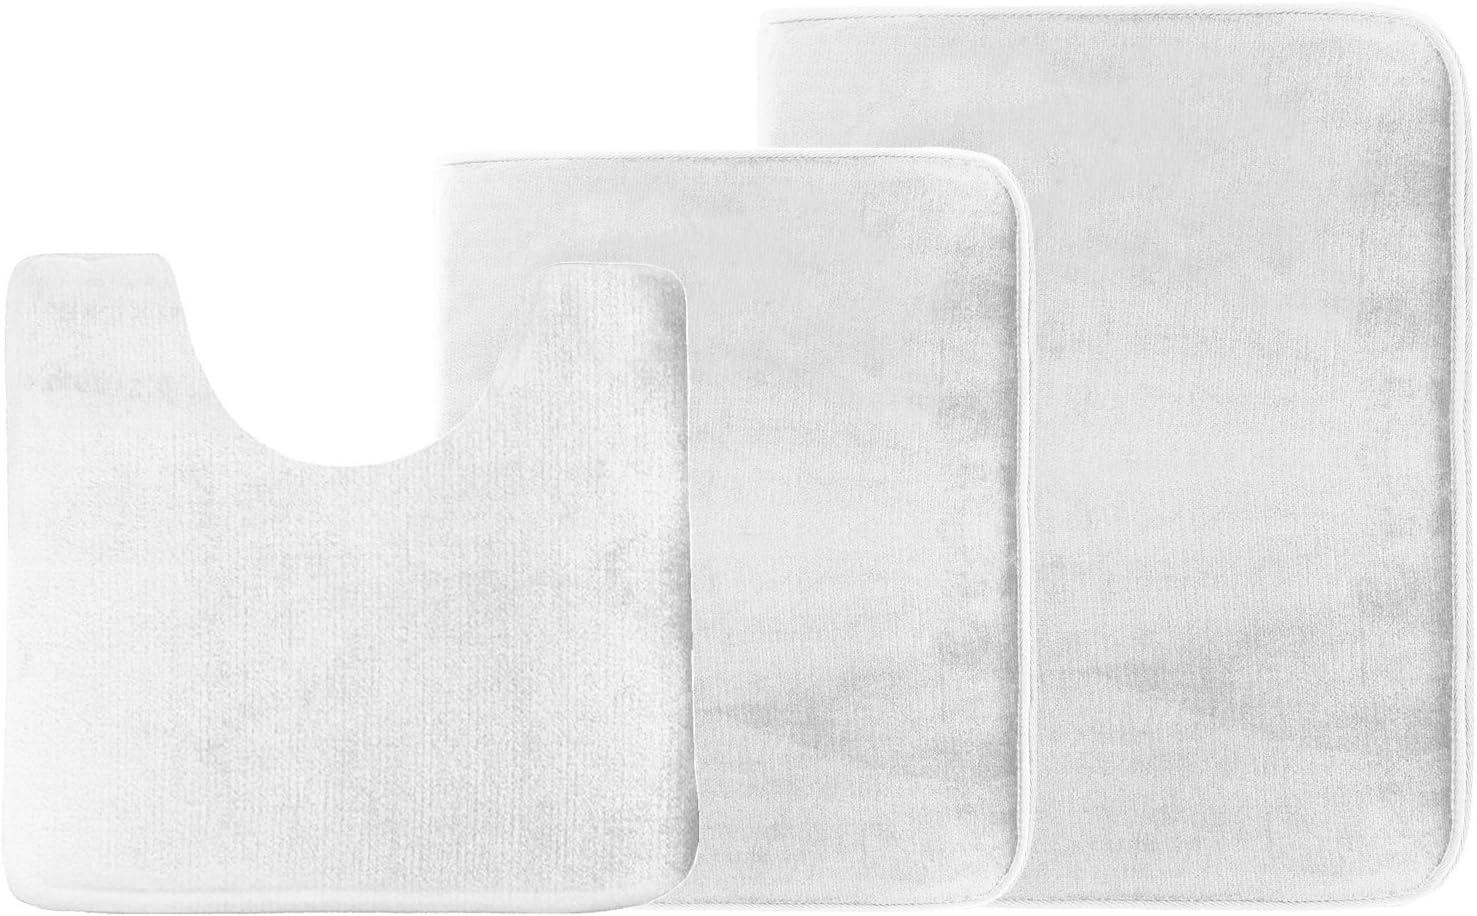 Clara Clark 3-Pack Bath Mat Set – Large, Small and Contour Bathroom Rug Set, Absorbent Memory Foam Bath Rugs, Non-Slip, Thick, Velvet Microfiber Bathrug, Plush Shower, Toilet Bathmats Carpet, White